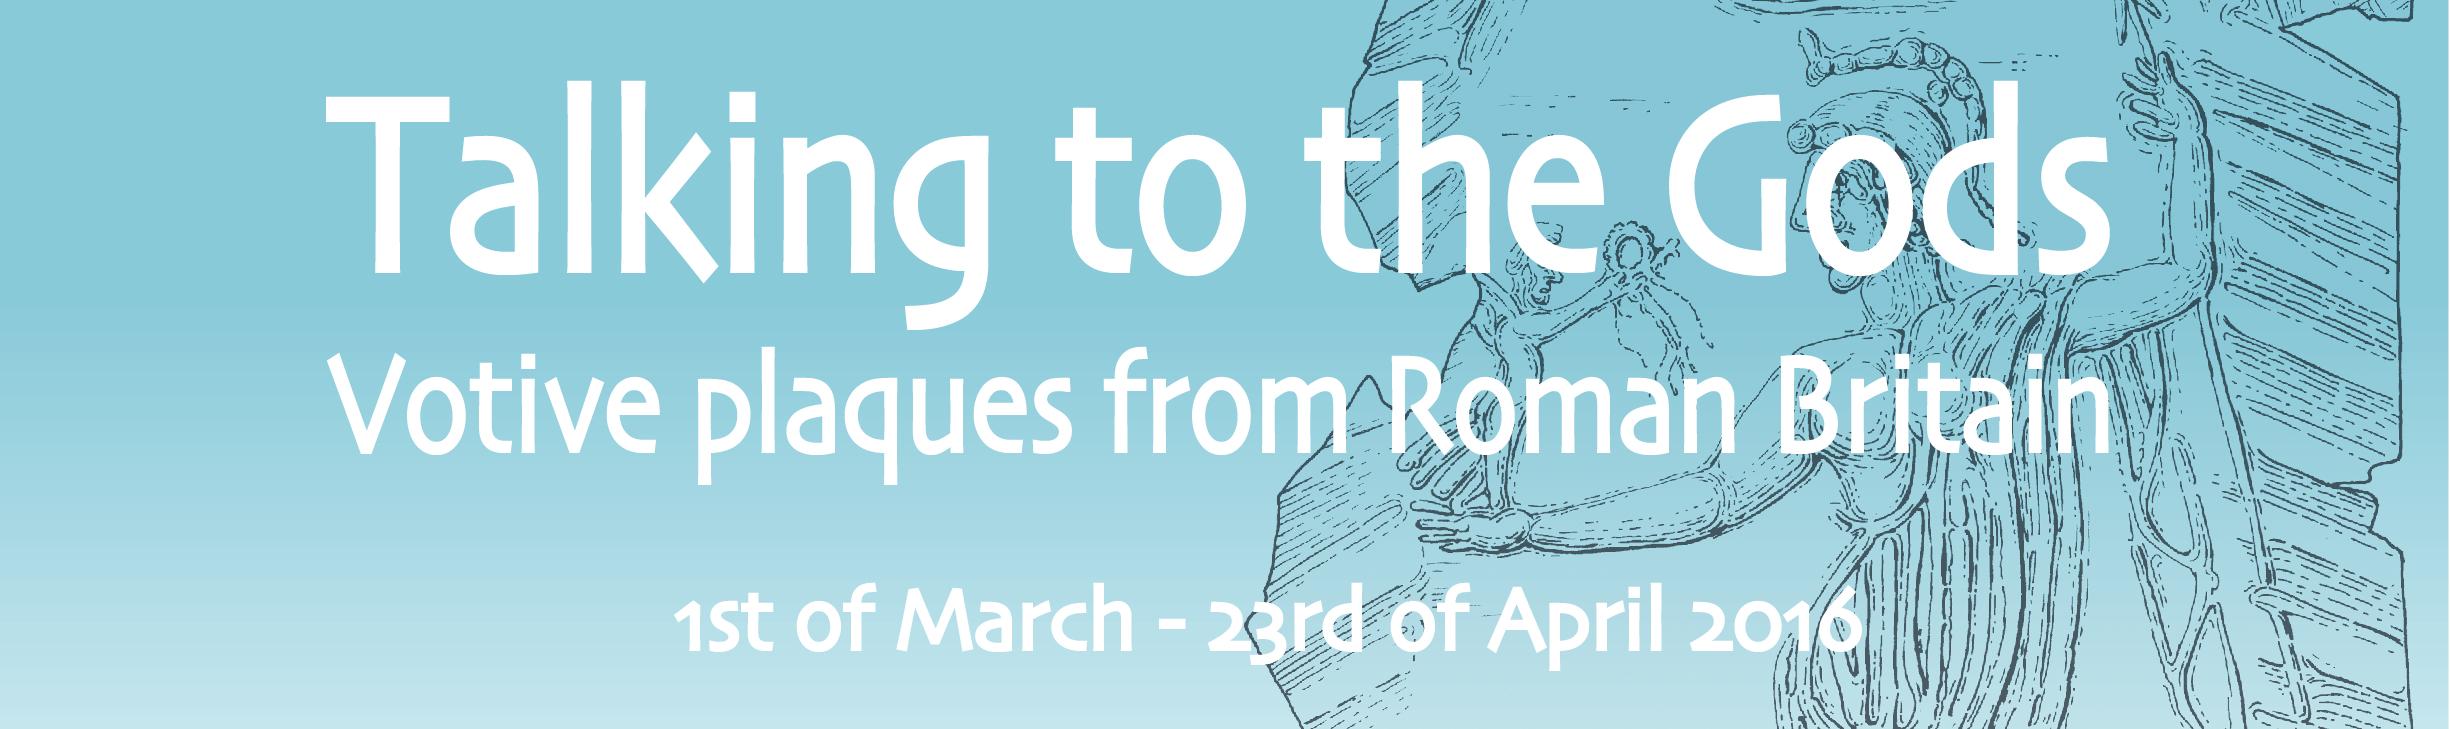 Votive plaques from Roman Britain